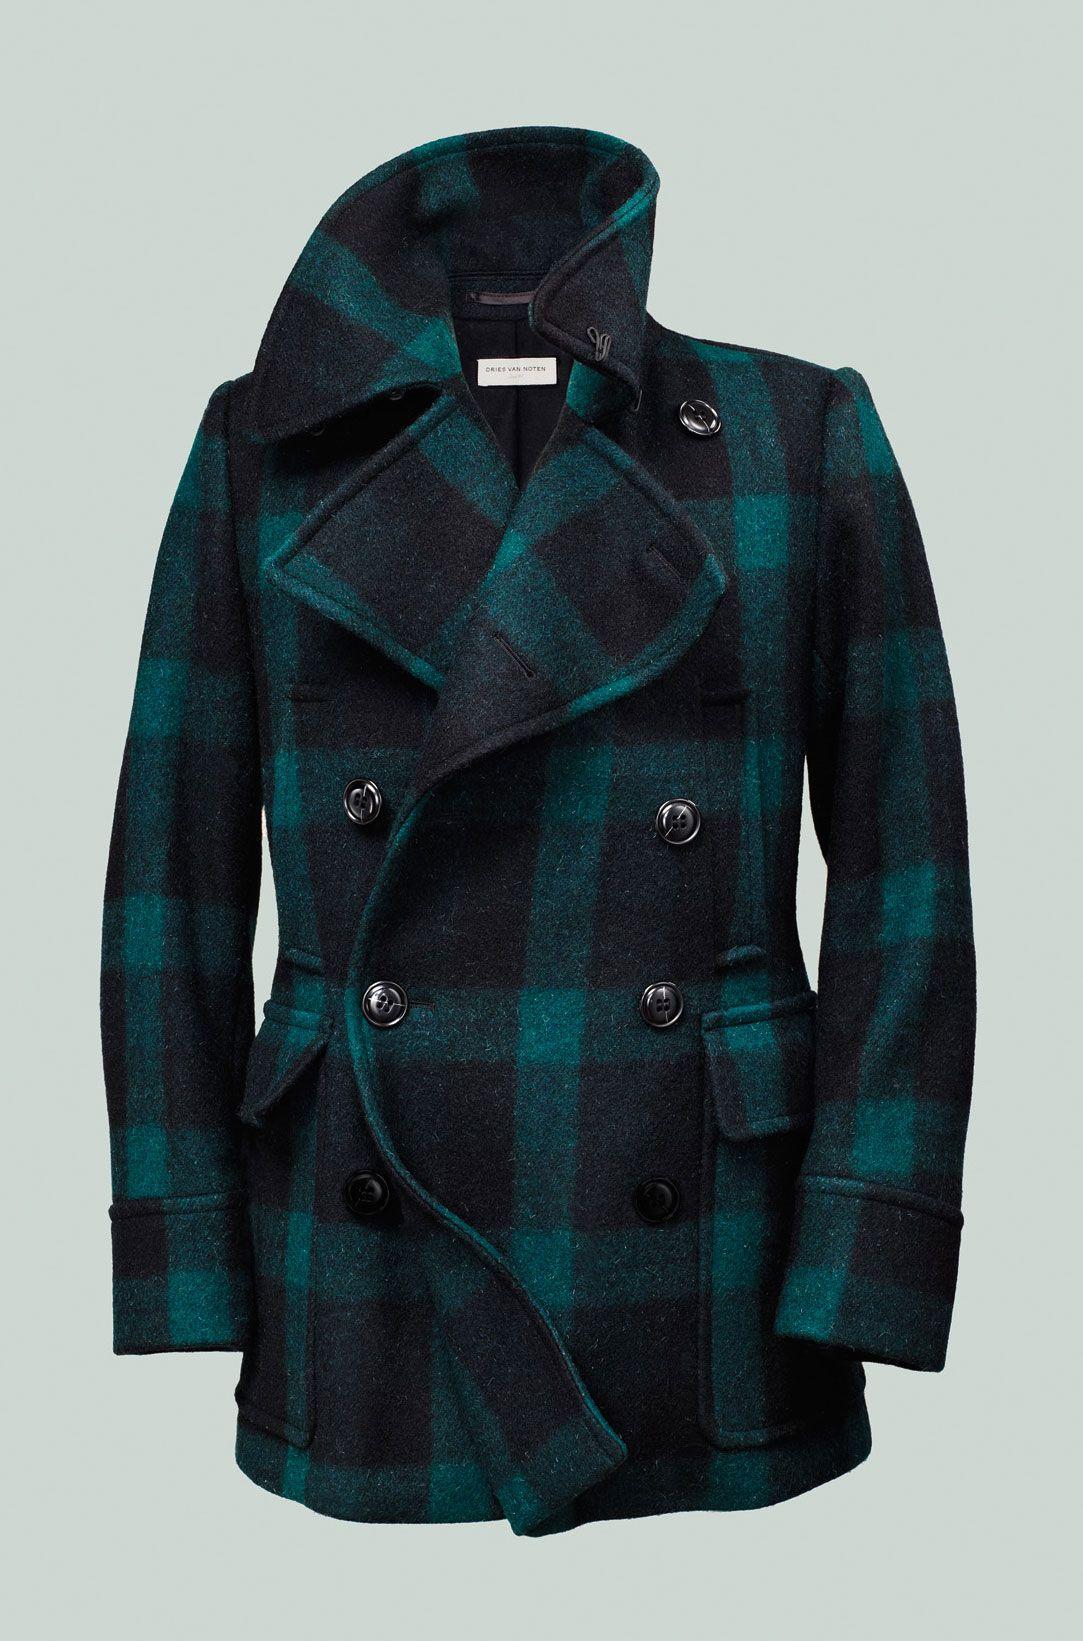 7d4f75548f Dries Van Noten plaid peacoat (forget the boyfriend jeans  wear his coat  instead)